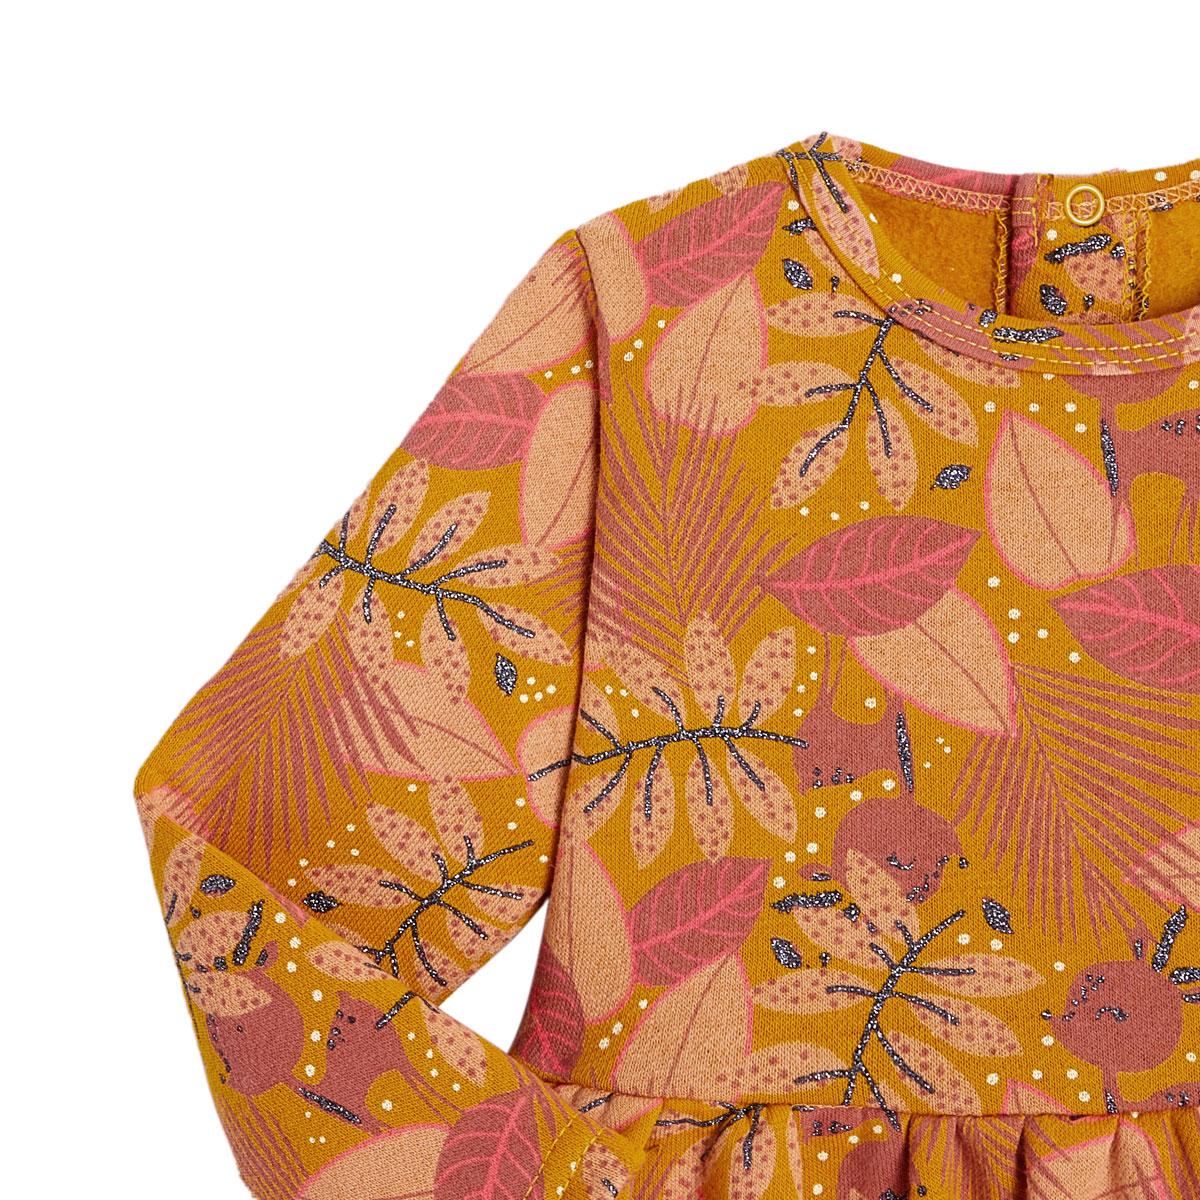 Robe fille en molleton, legging et bandeau contenant du coton bio Papaye zoom